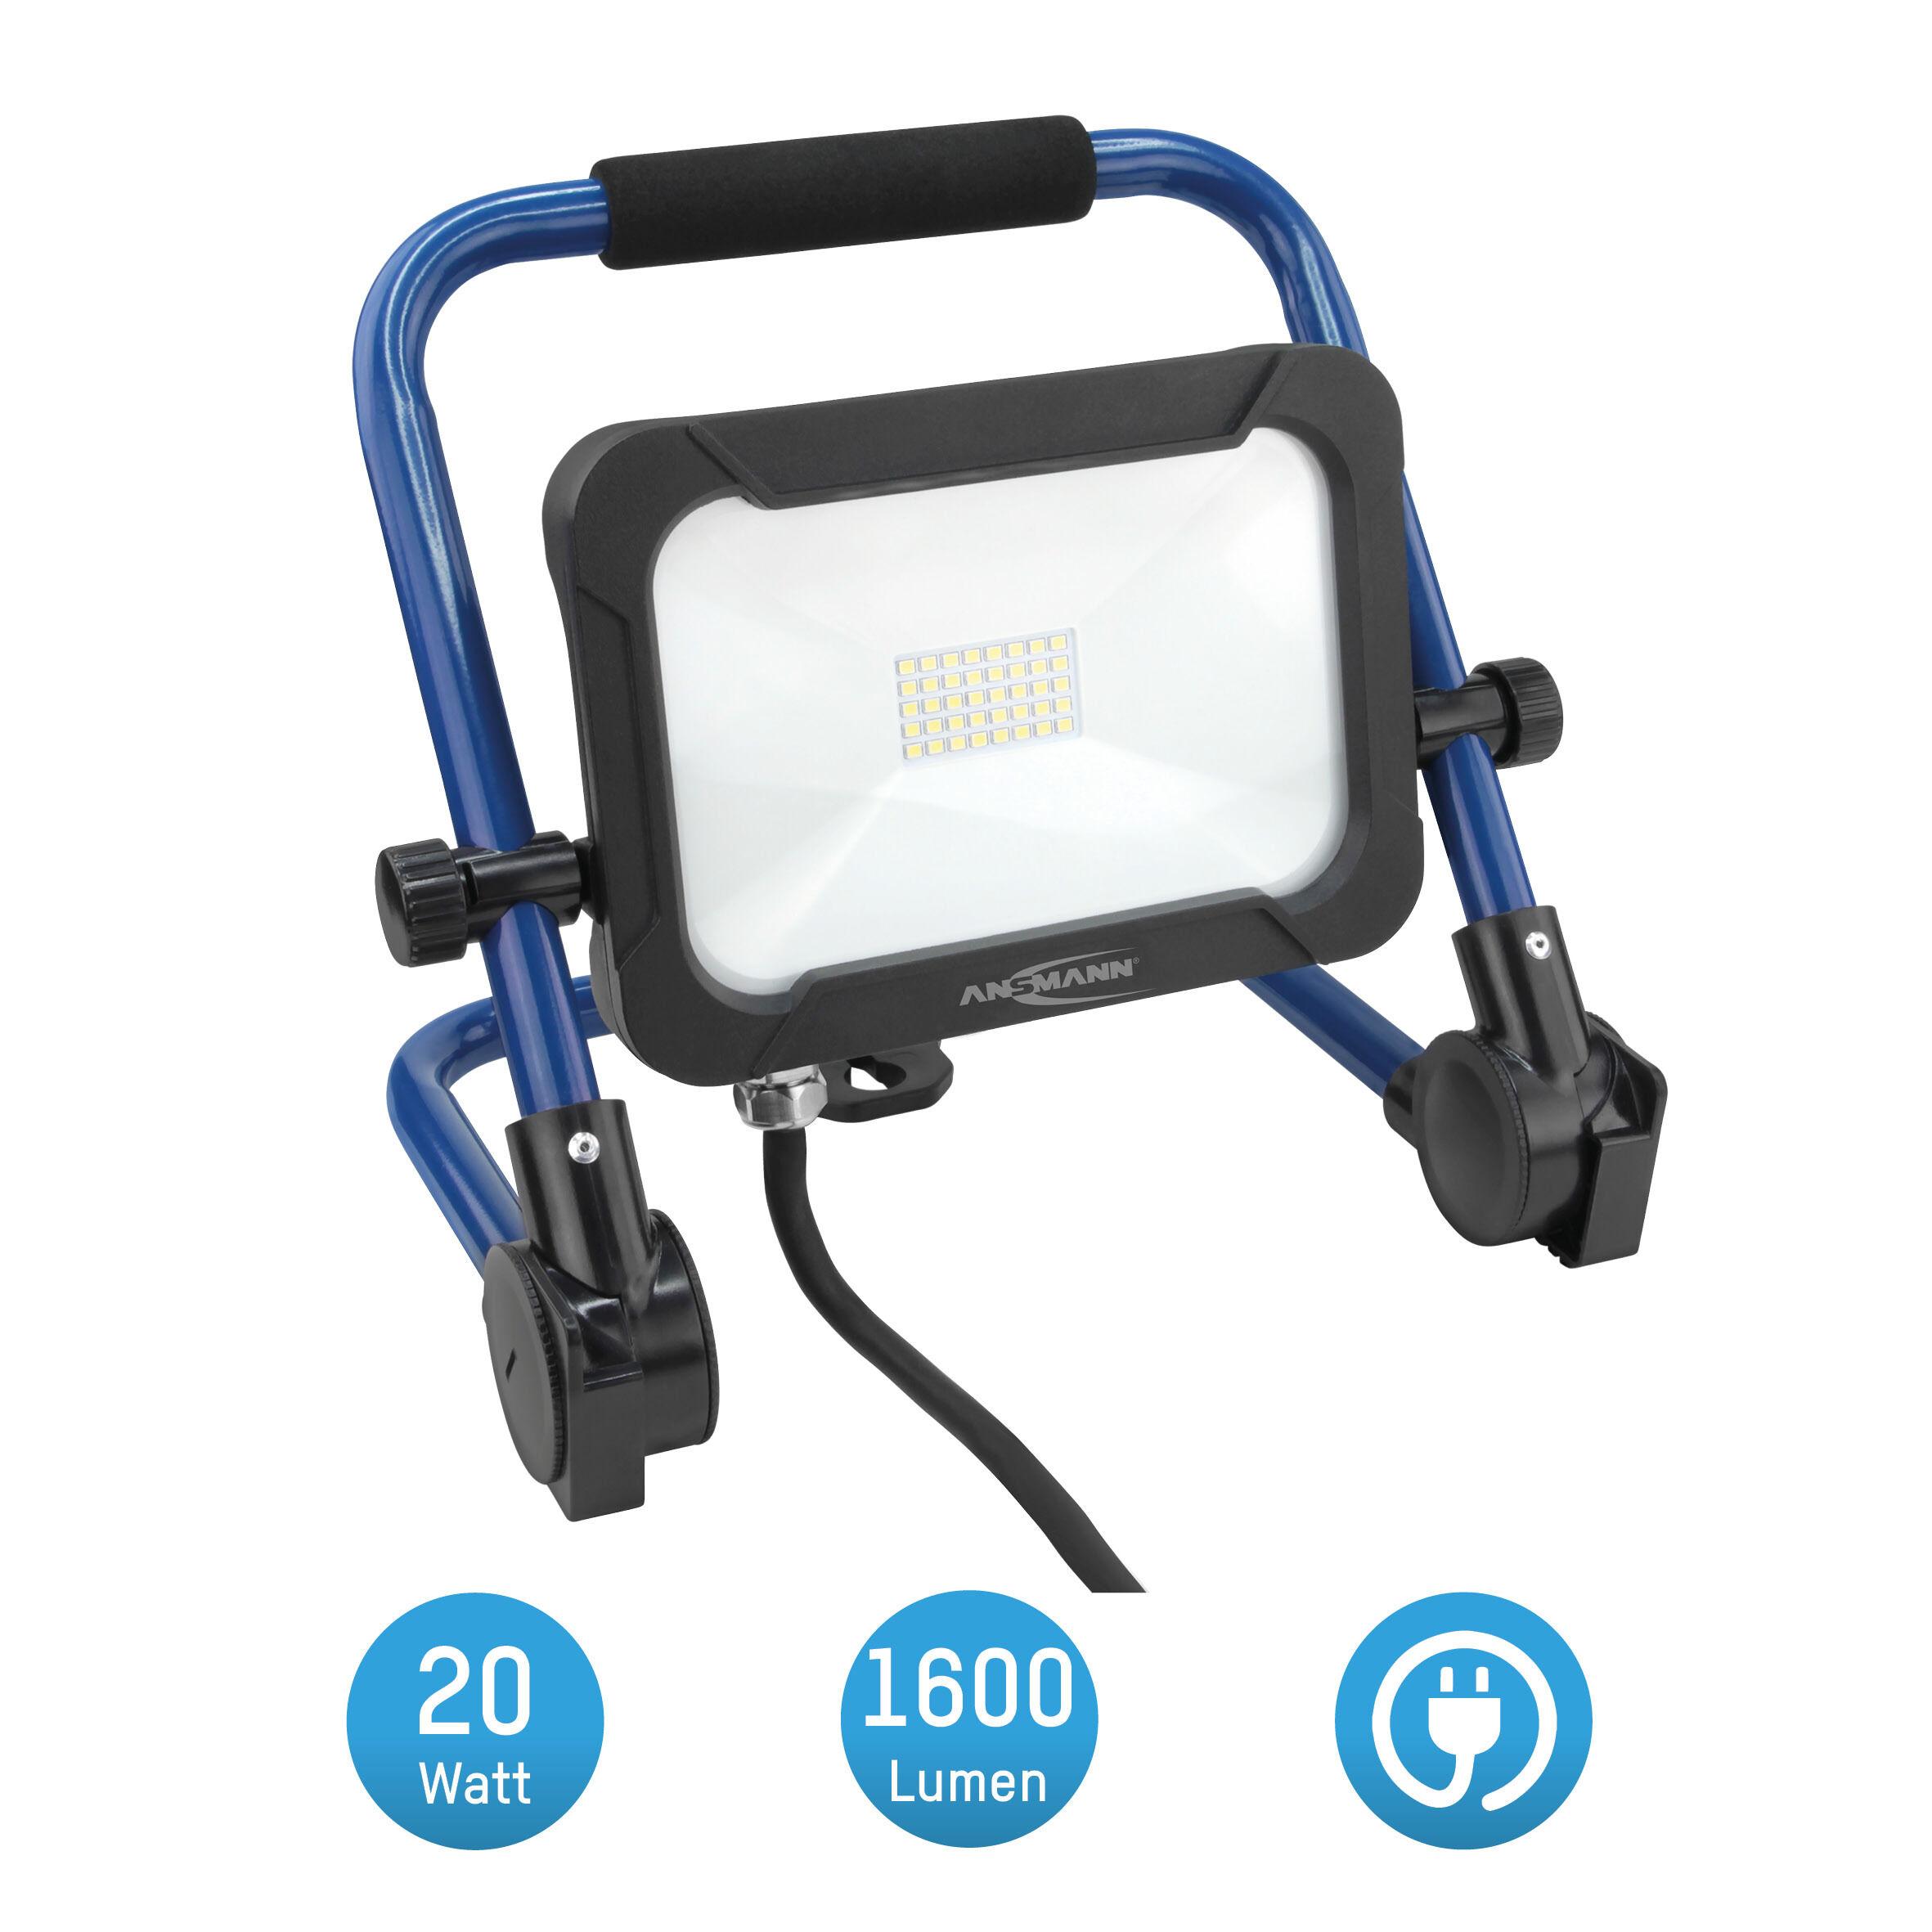 ANSMANN Baustrahler LED 20W – Baustellen Lampe, Bau Leuchte, IP54 wetterfest